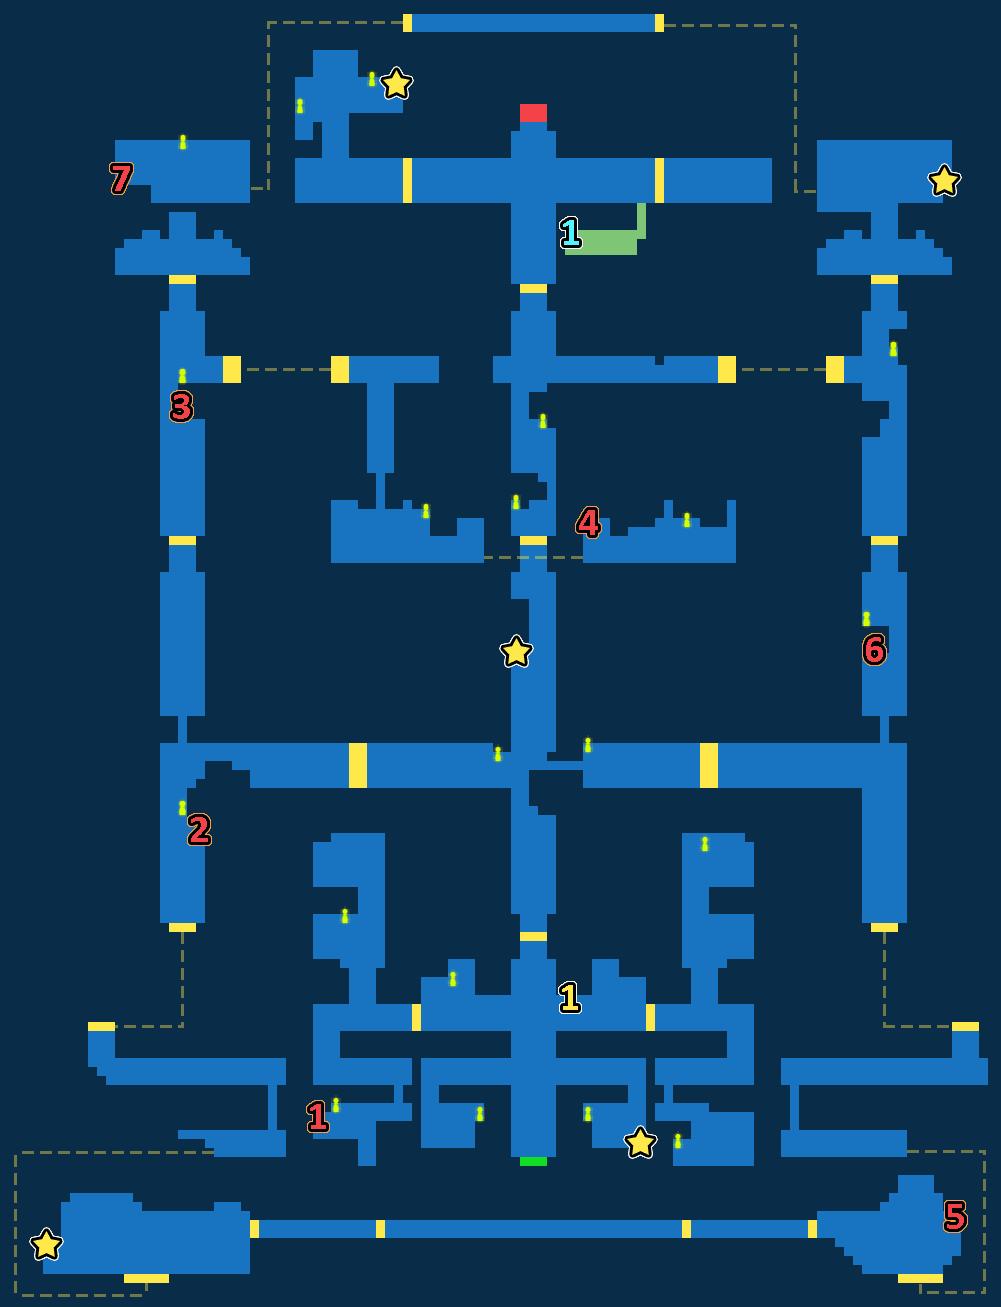 Treasure Map of Dwarves' Forge